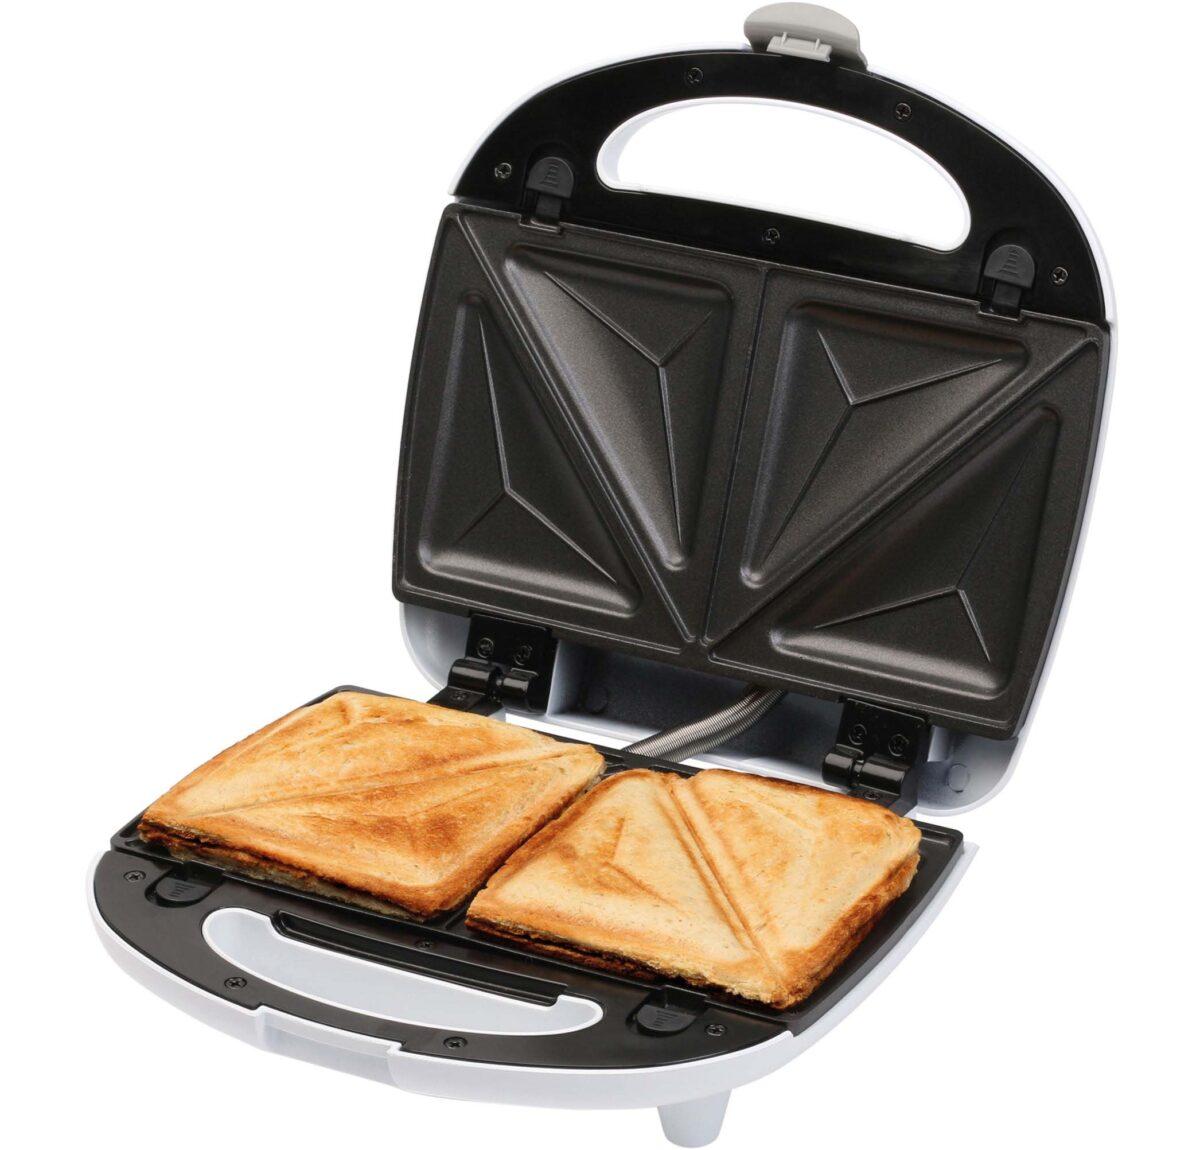 صفحات ساندویچ ساز سنکور SSM 9300